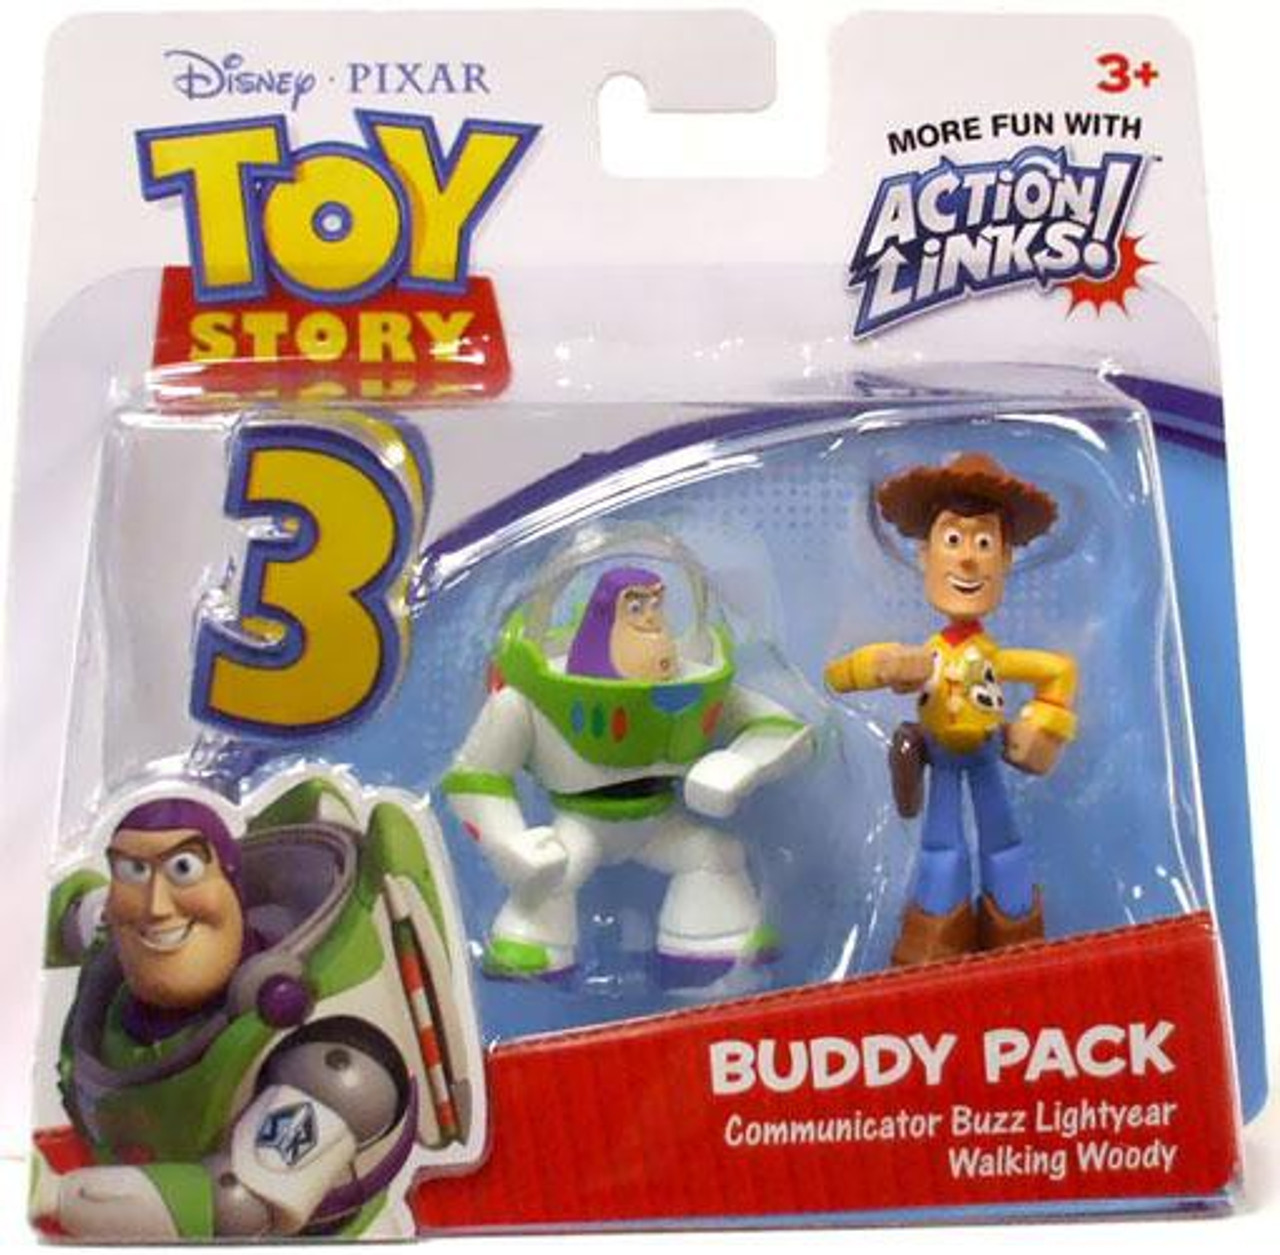 Toy Story 3 Action Links Buddy Pack Communicator Buzz Lightyear Walking  Woody Mini Figure 2-Pack Mattel Toys - ToyWiz e34ca6fa5c9